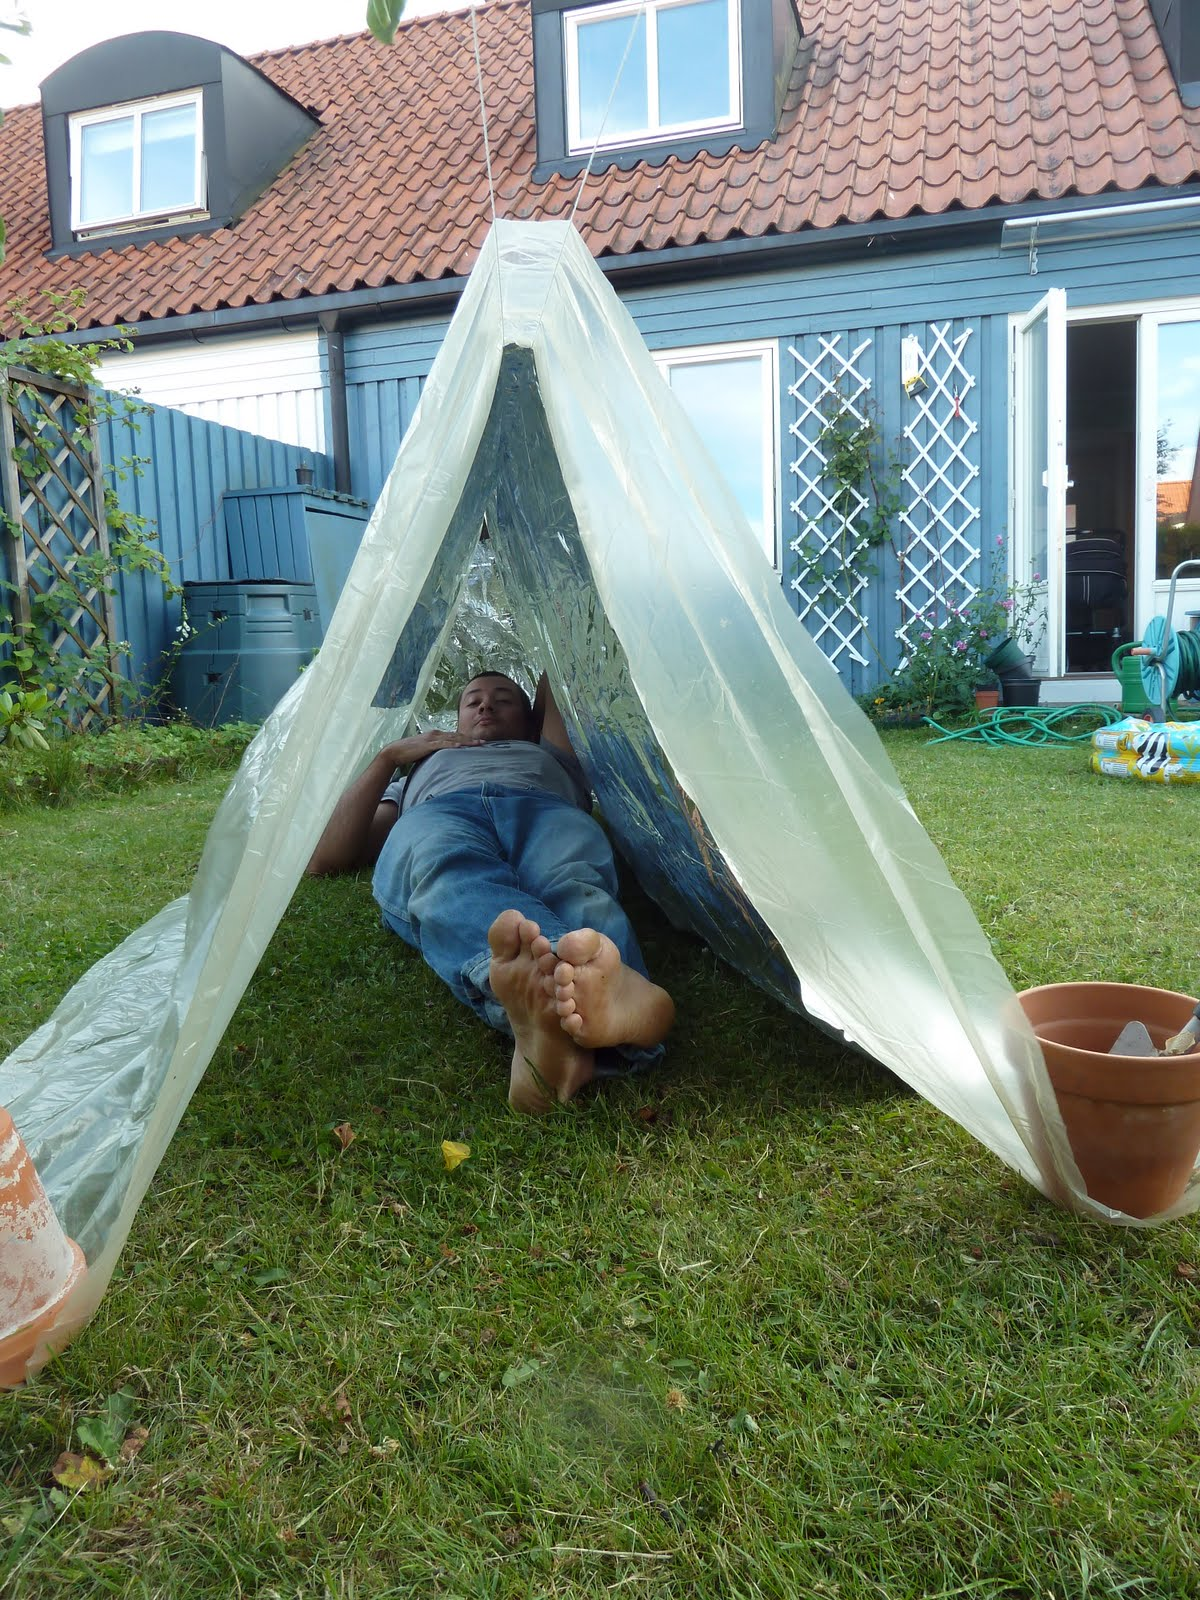 Diy Car Shelter Camping : Cesar and the woods my favorite diy myog camping shelter